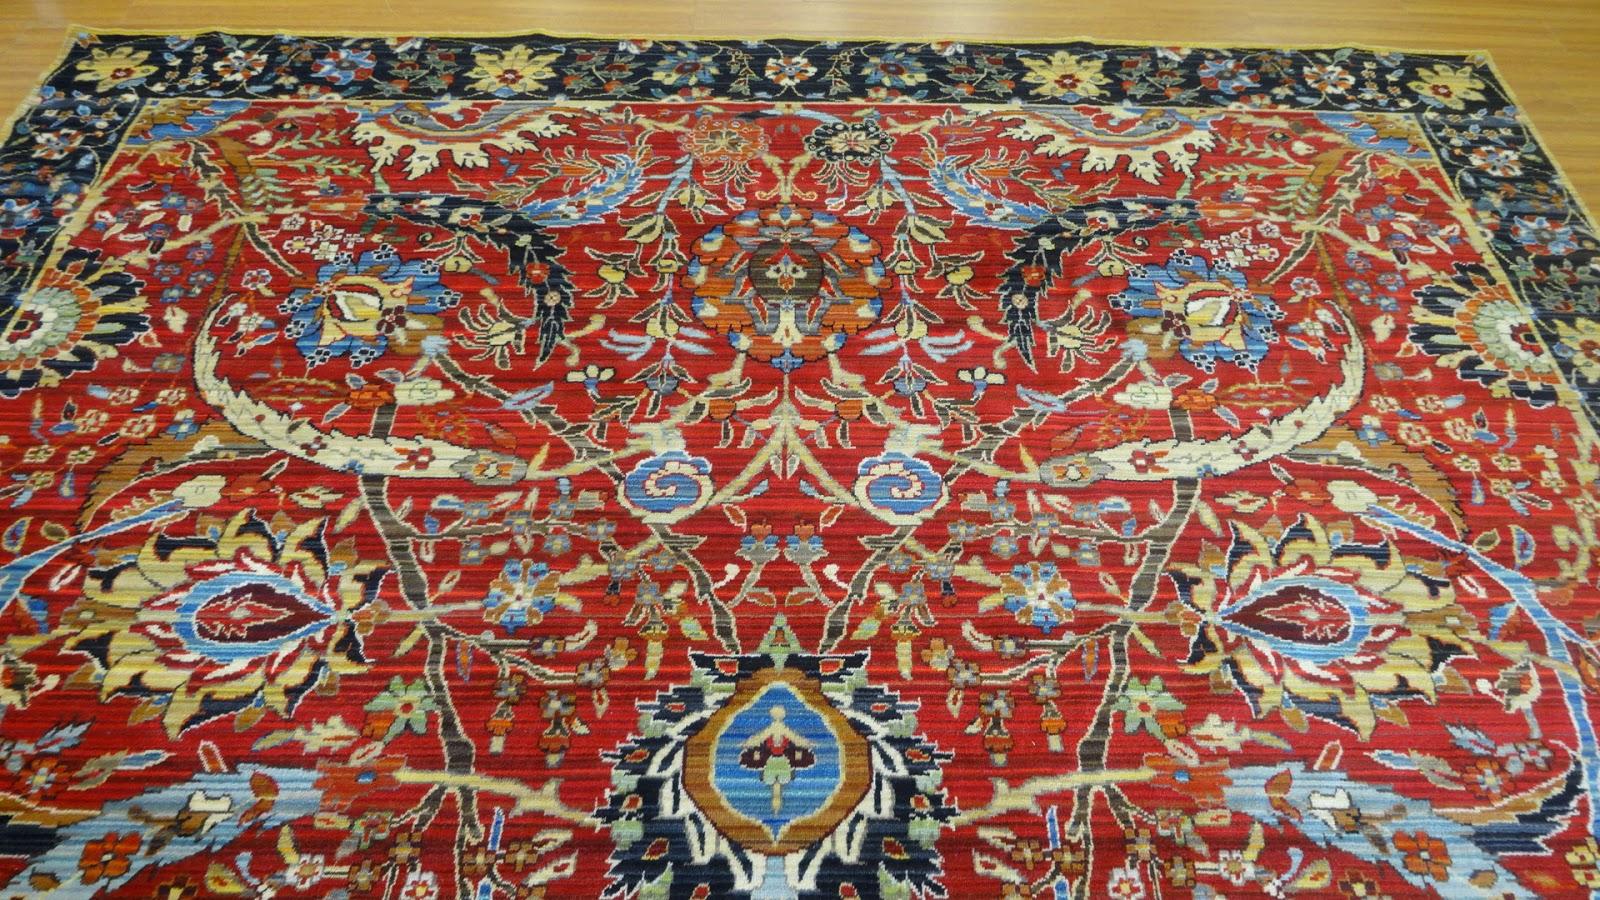 Most Expensive Carpets In The World Carpet Vidalondon